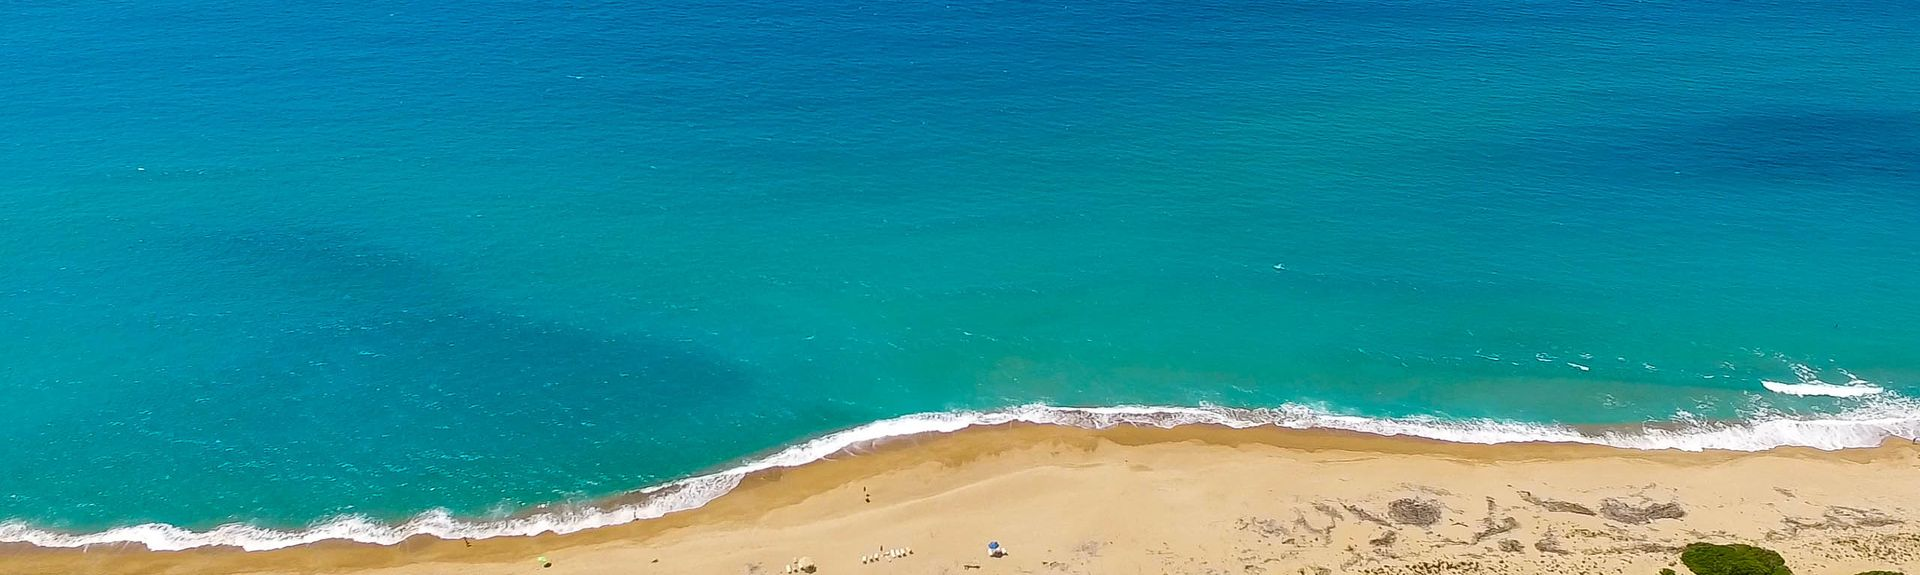 Pilos, Greece